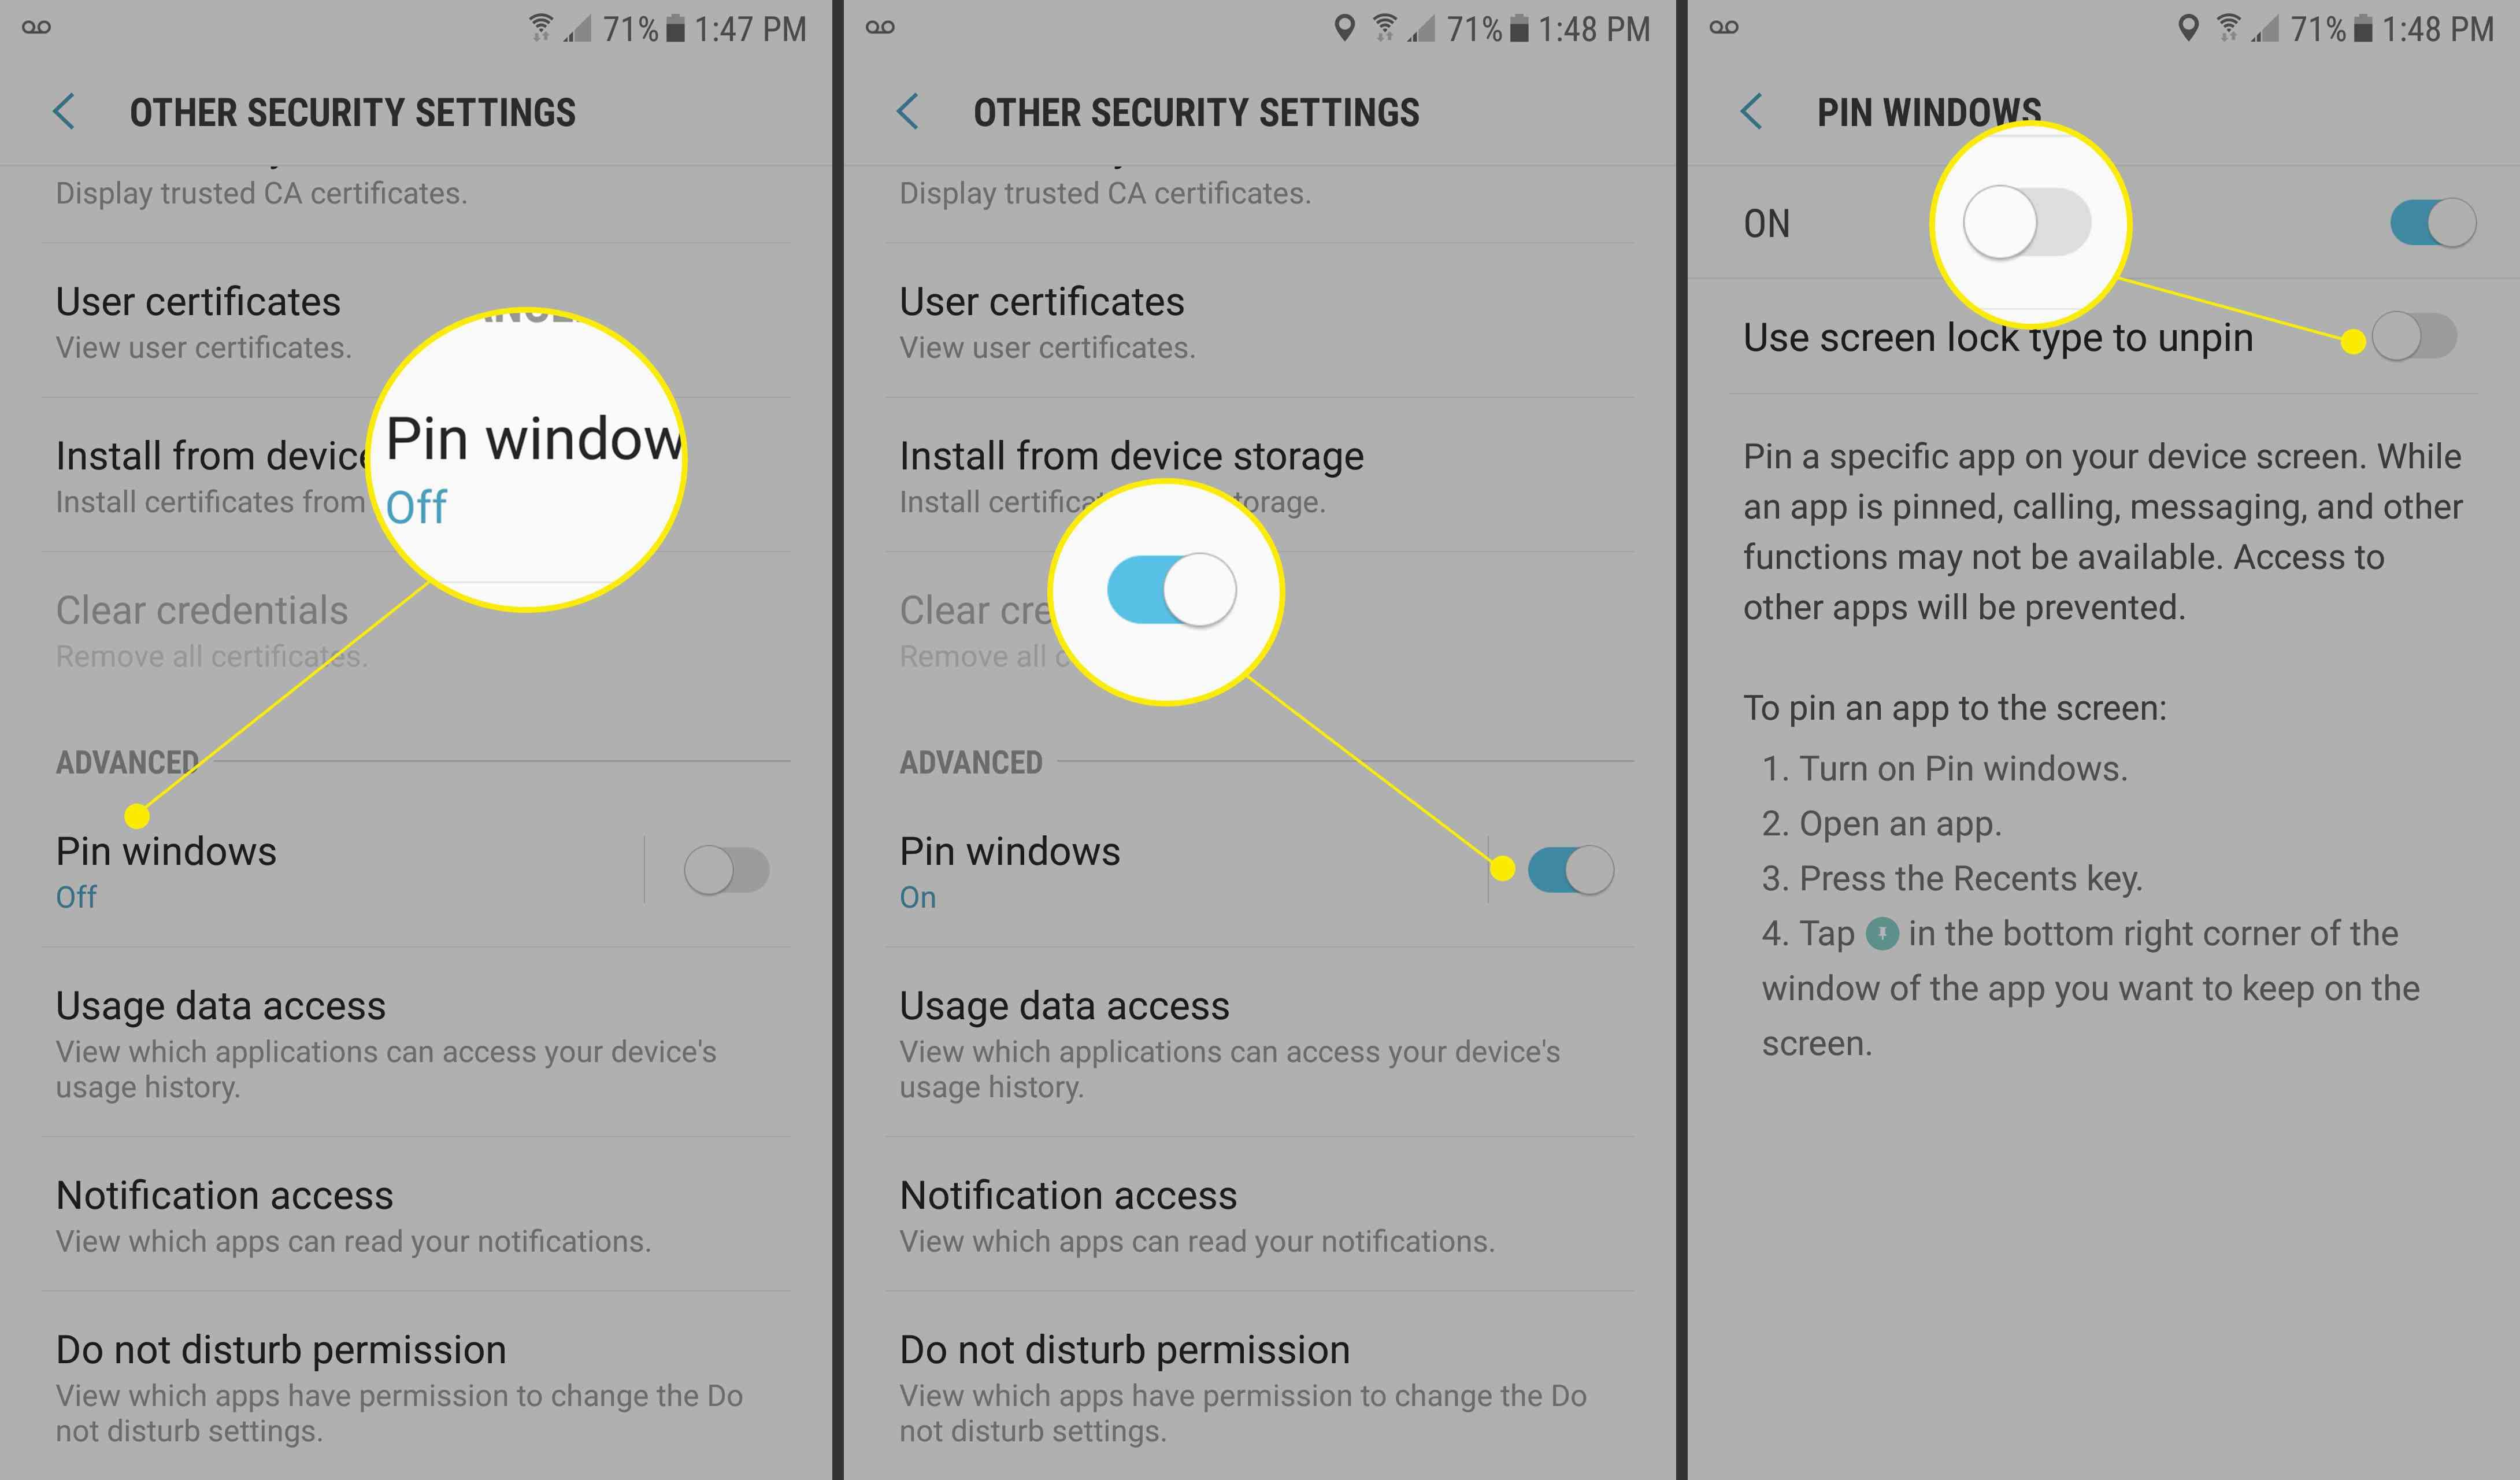 Screenshots of navigation to Pin Windows settings.